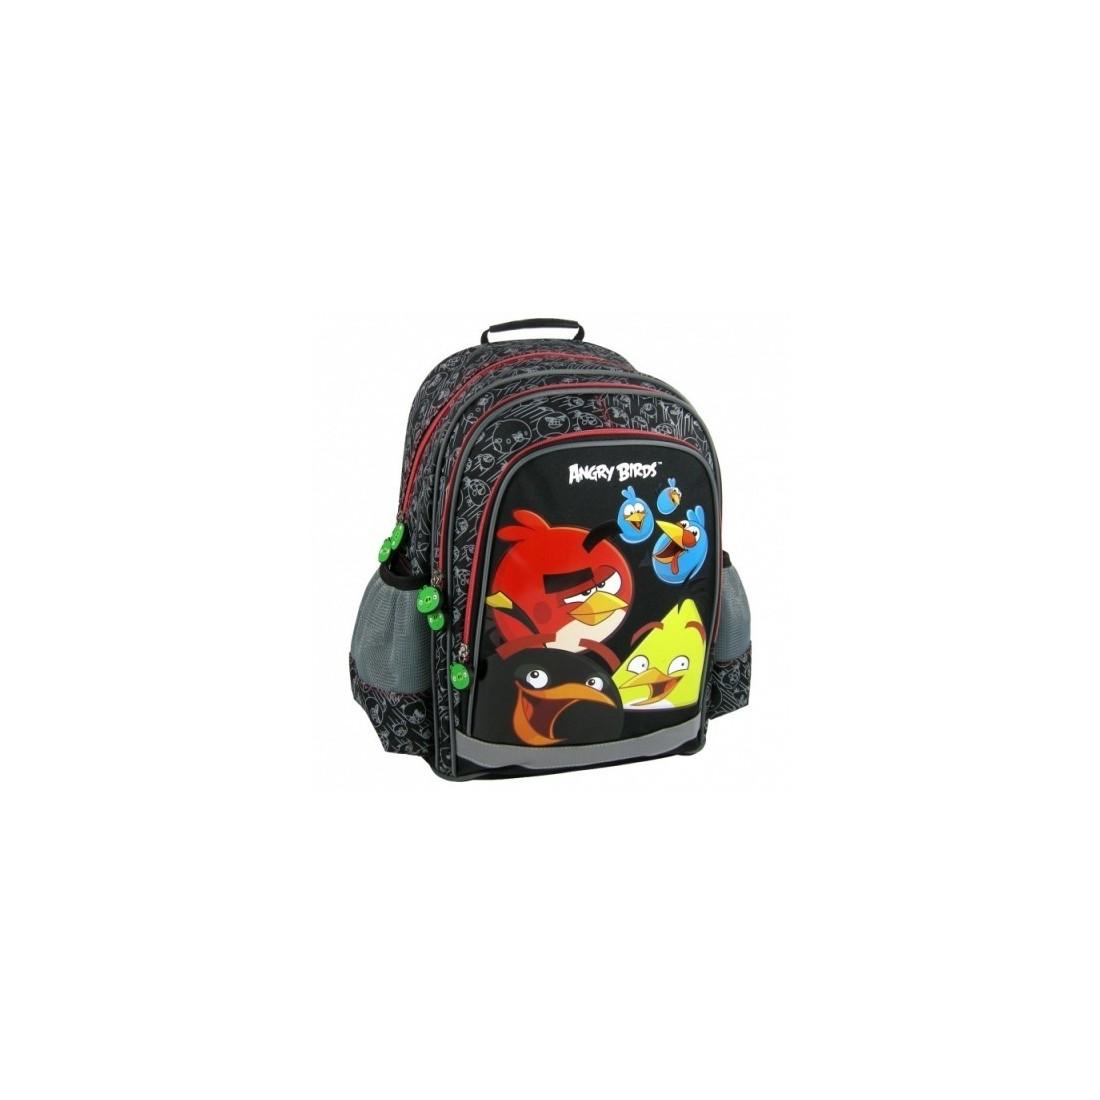 2659f67b52dab Plecak Szkolny Angry Birds - plecak-tornister.pl